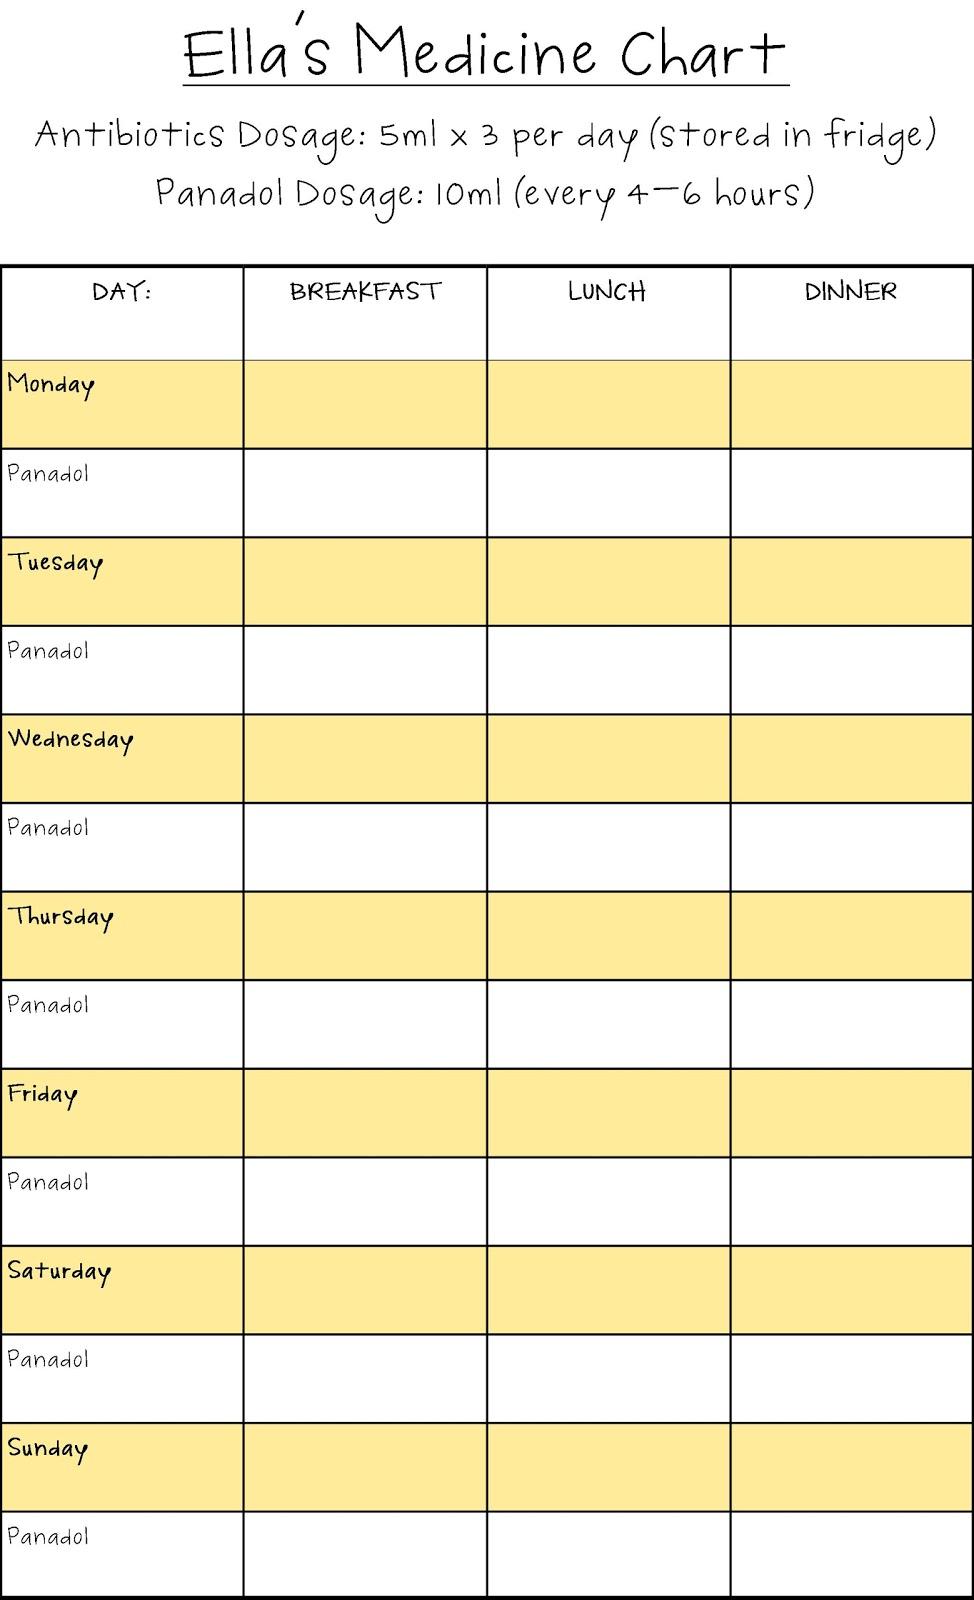 Printable Medication Schedule Image Result For Medicine Chart - Free Printable Daily Medication Schedule